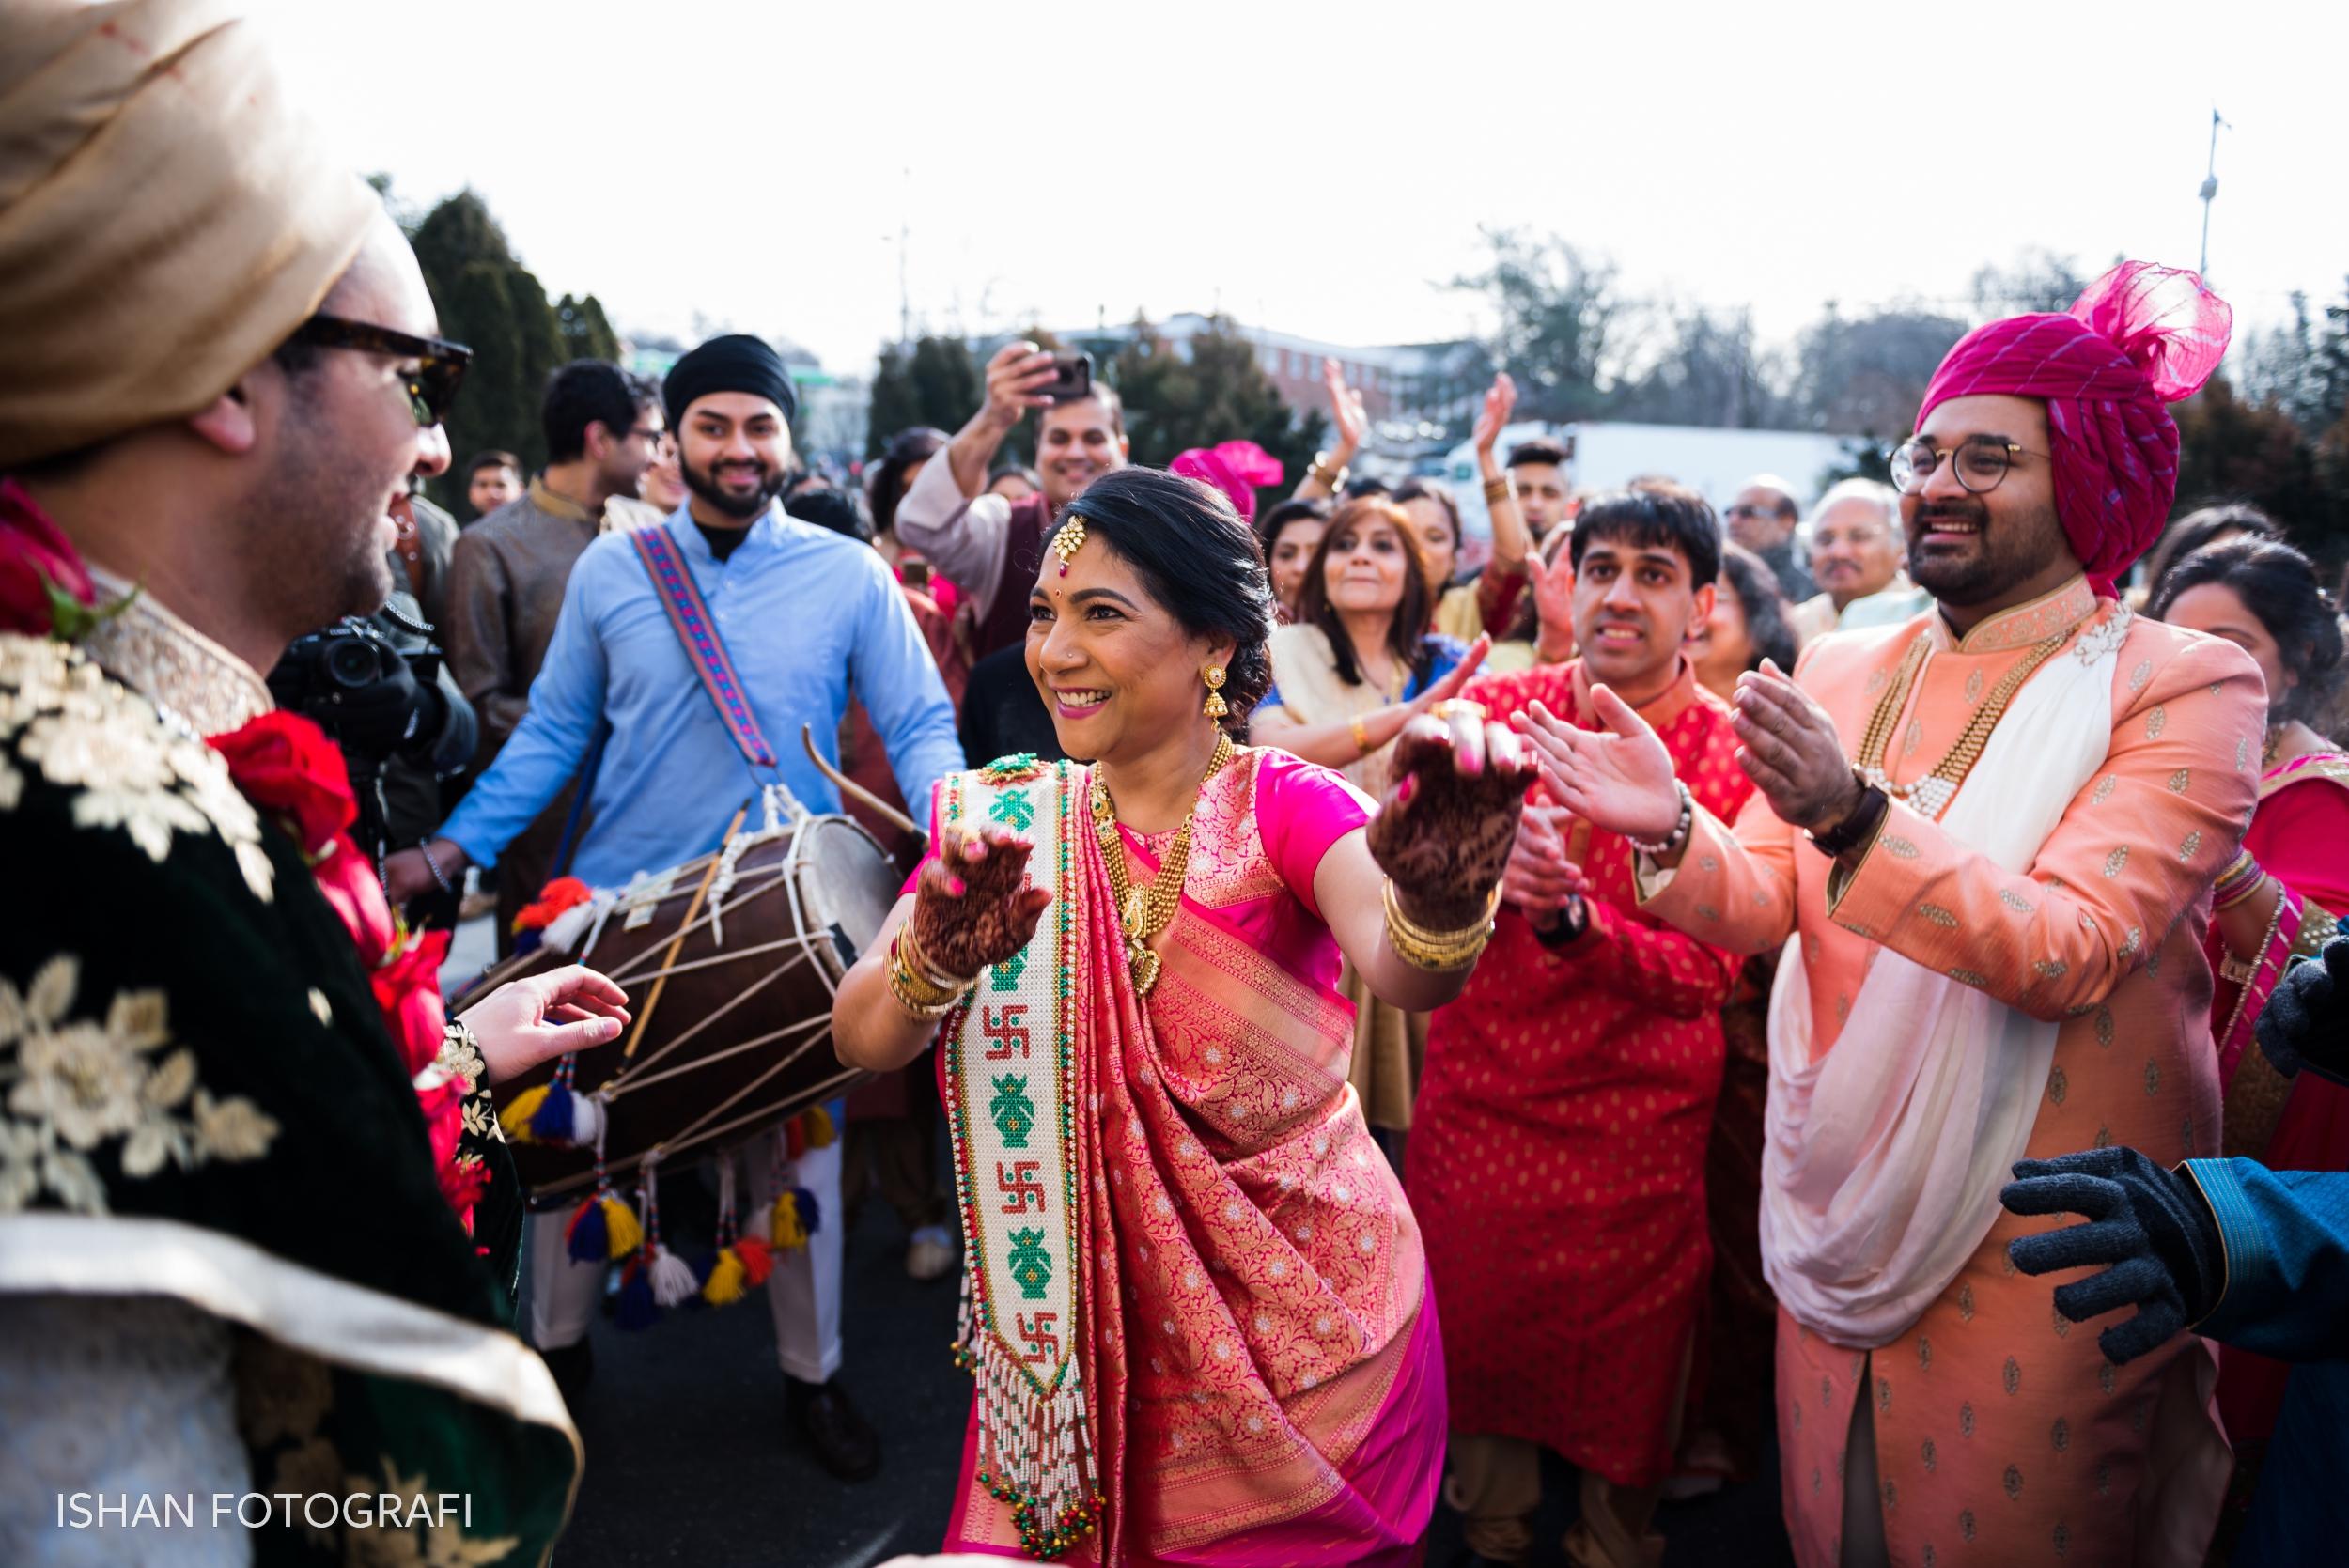 leonard's-palazzo-south-asian-wedding-baraat-photos